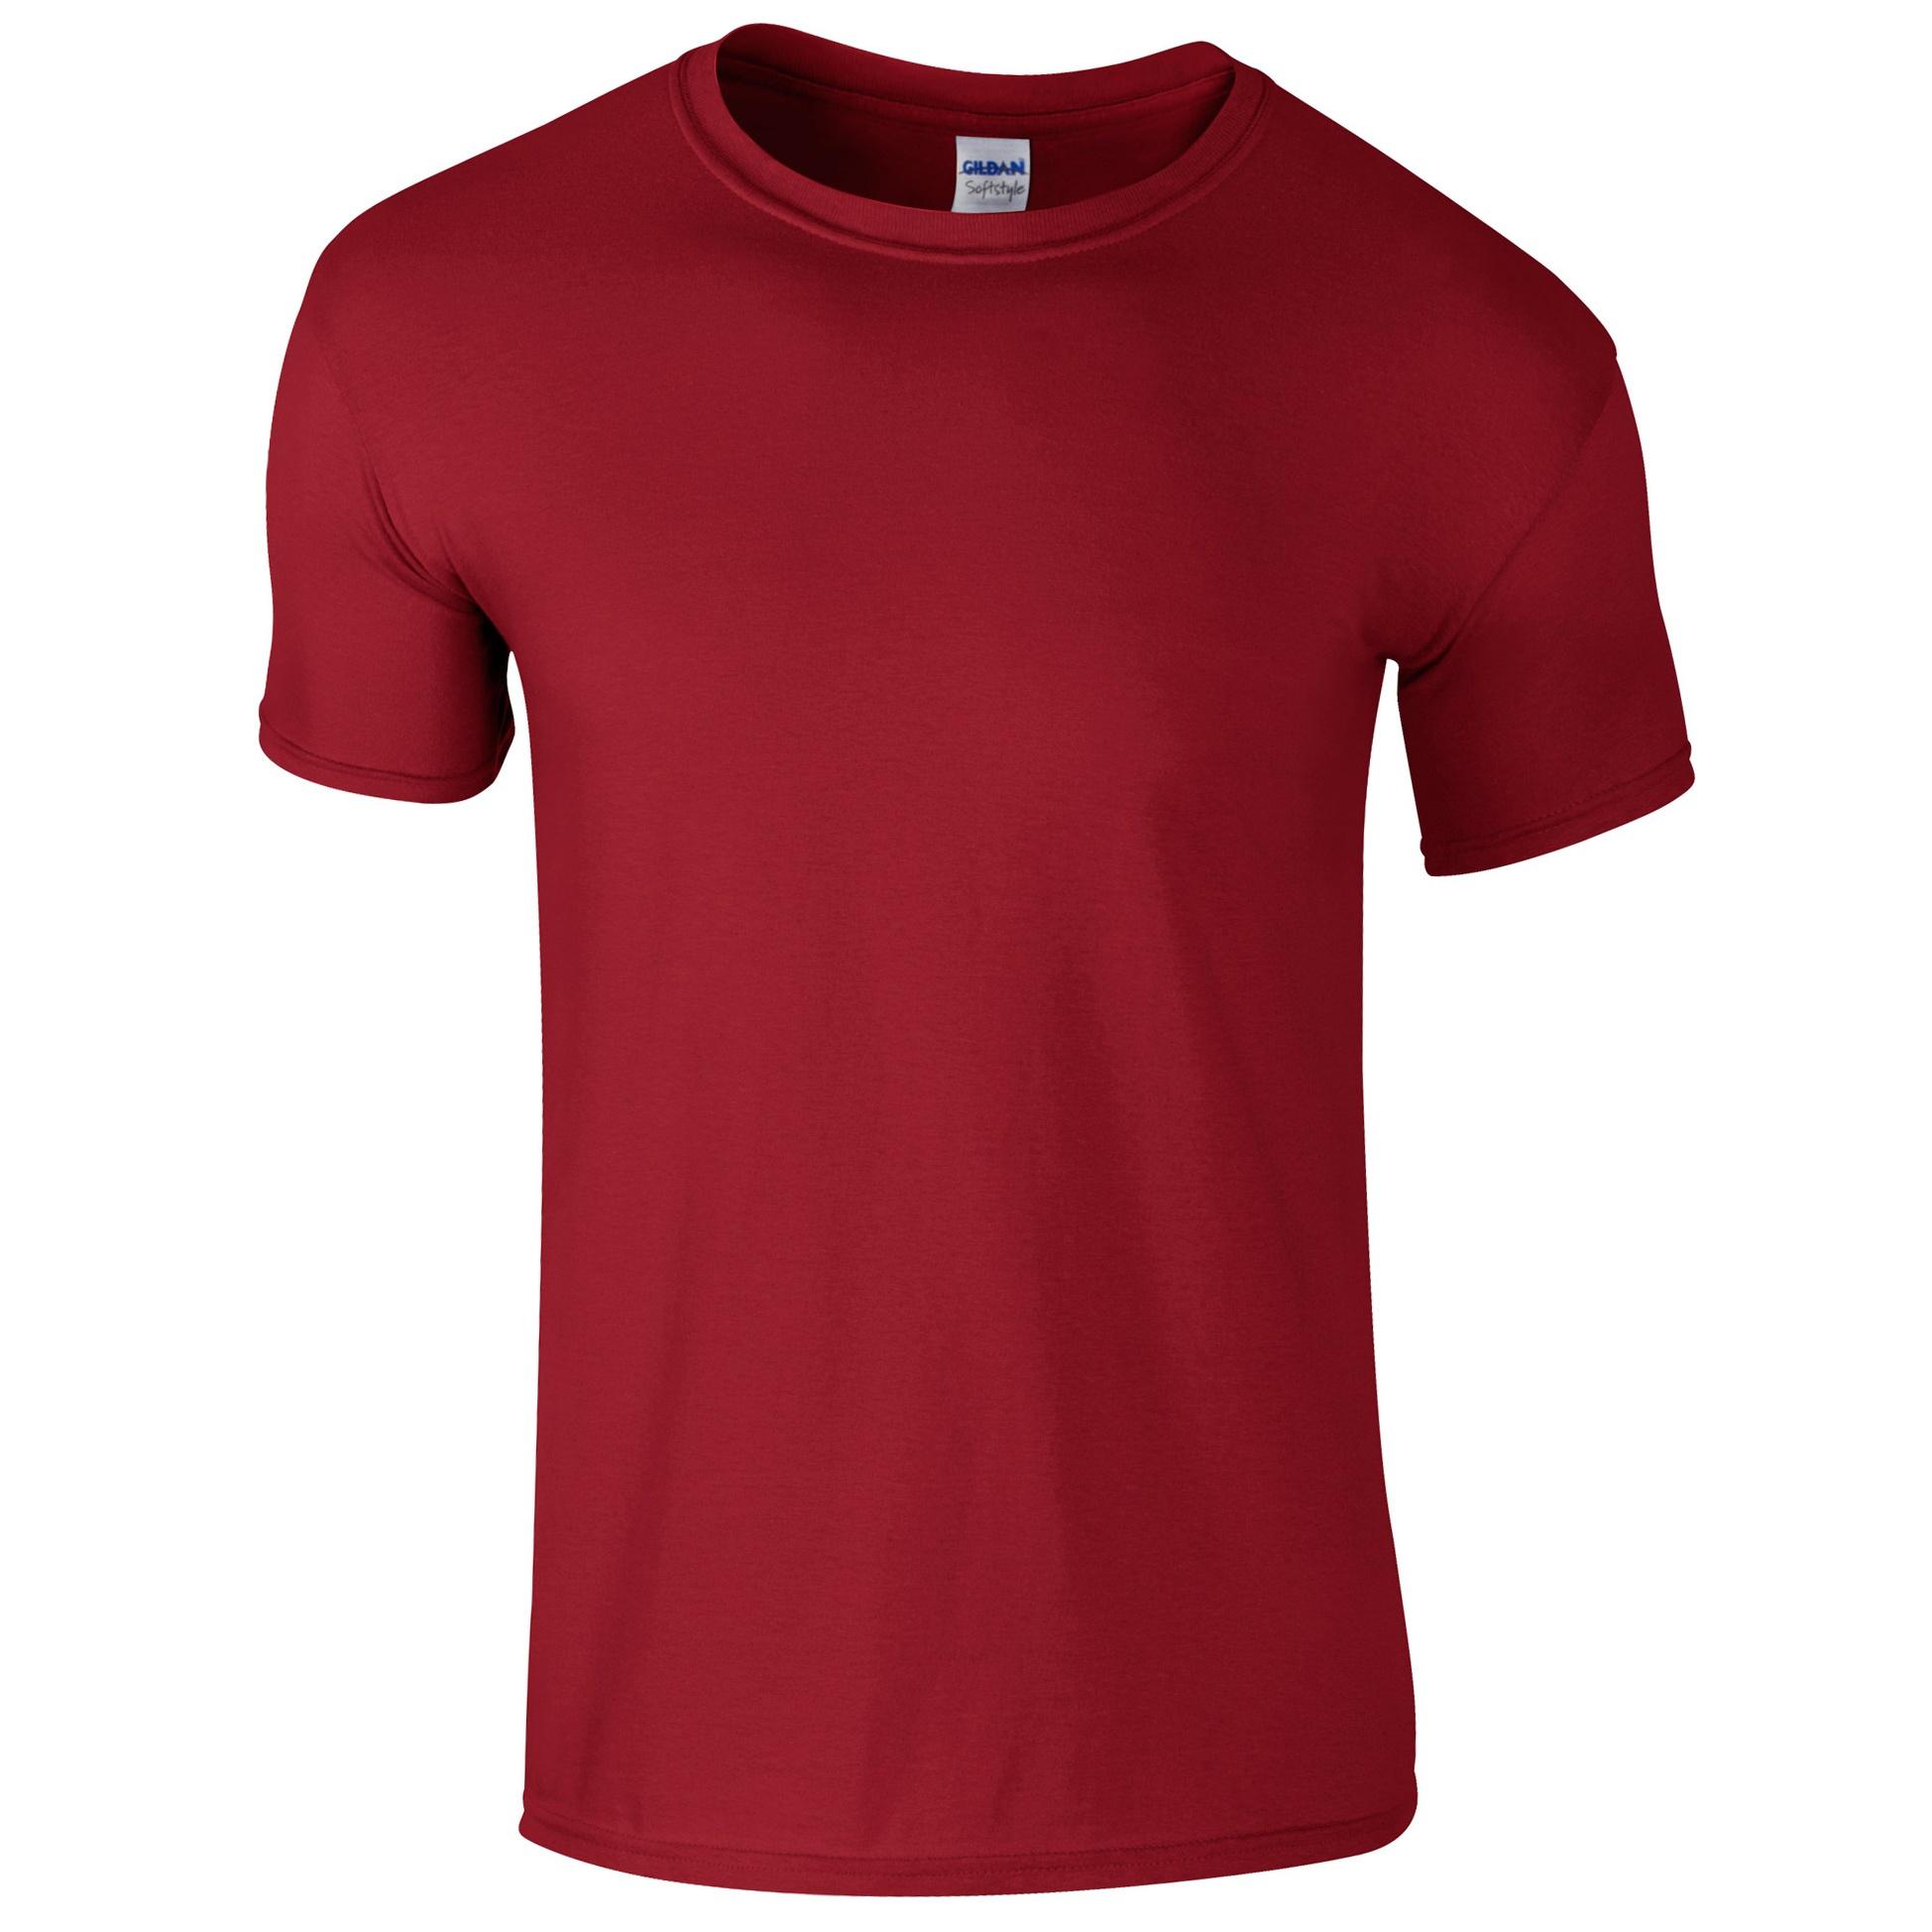 Gildan mens short sleeve soft style t shirt ebay for Mens extra short sleeve t shirts